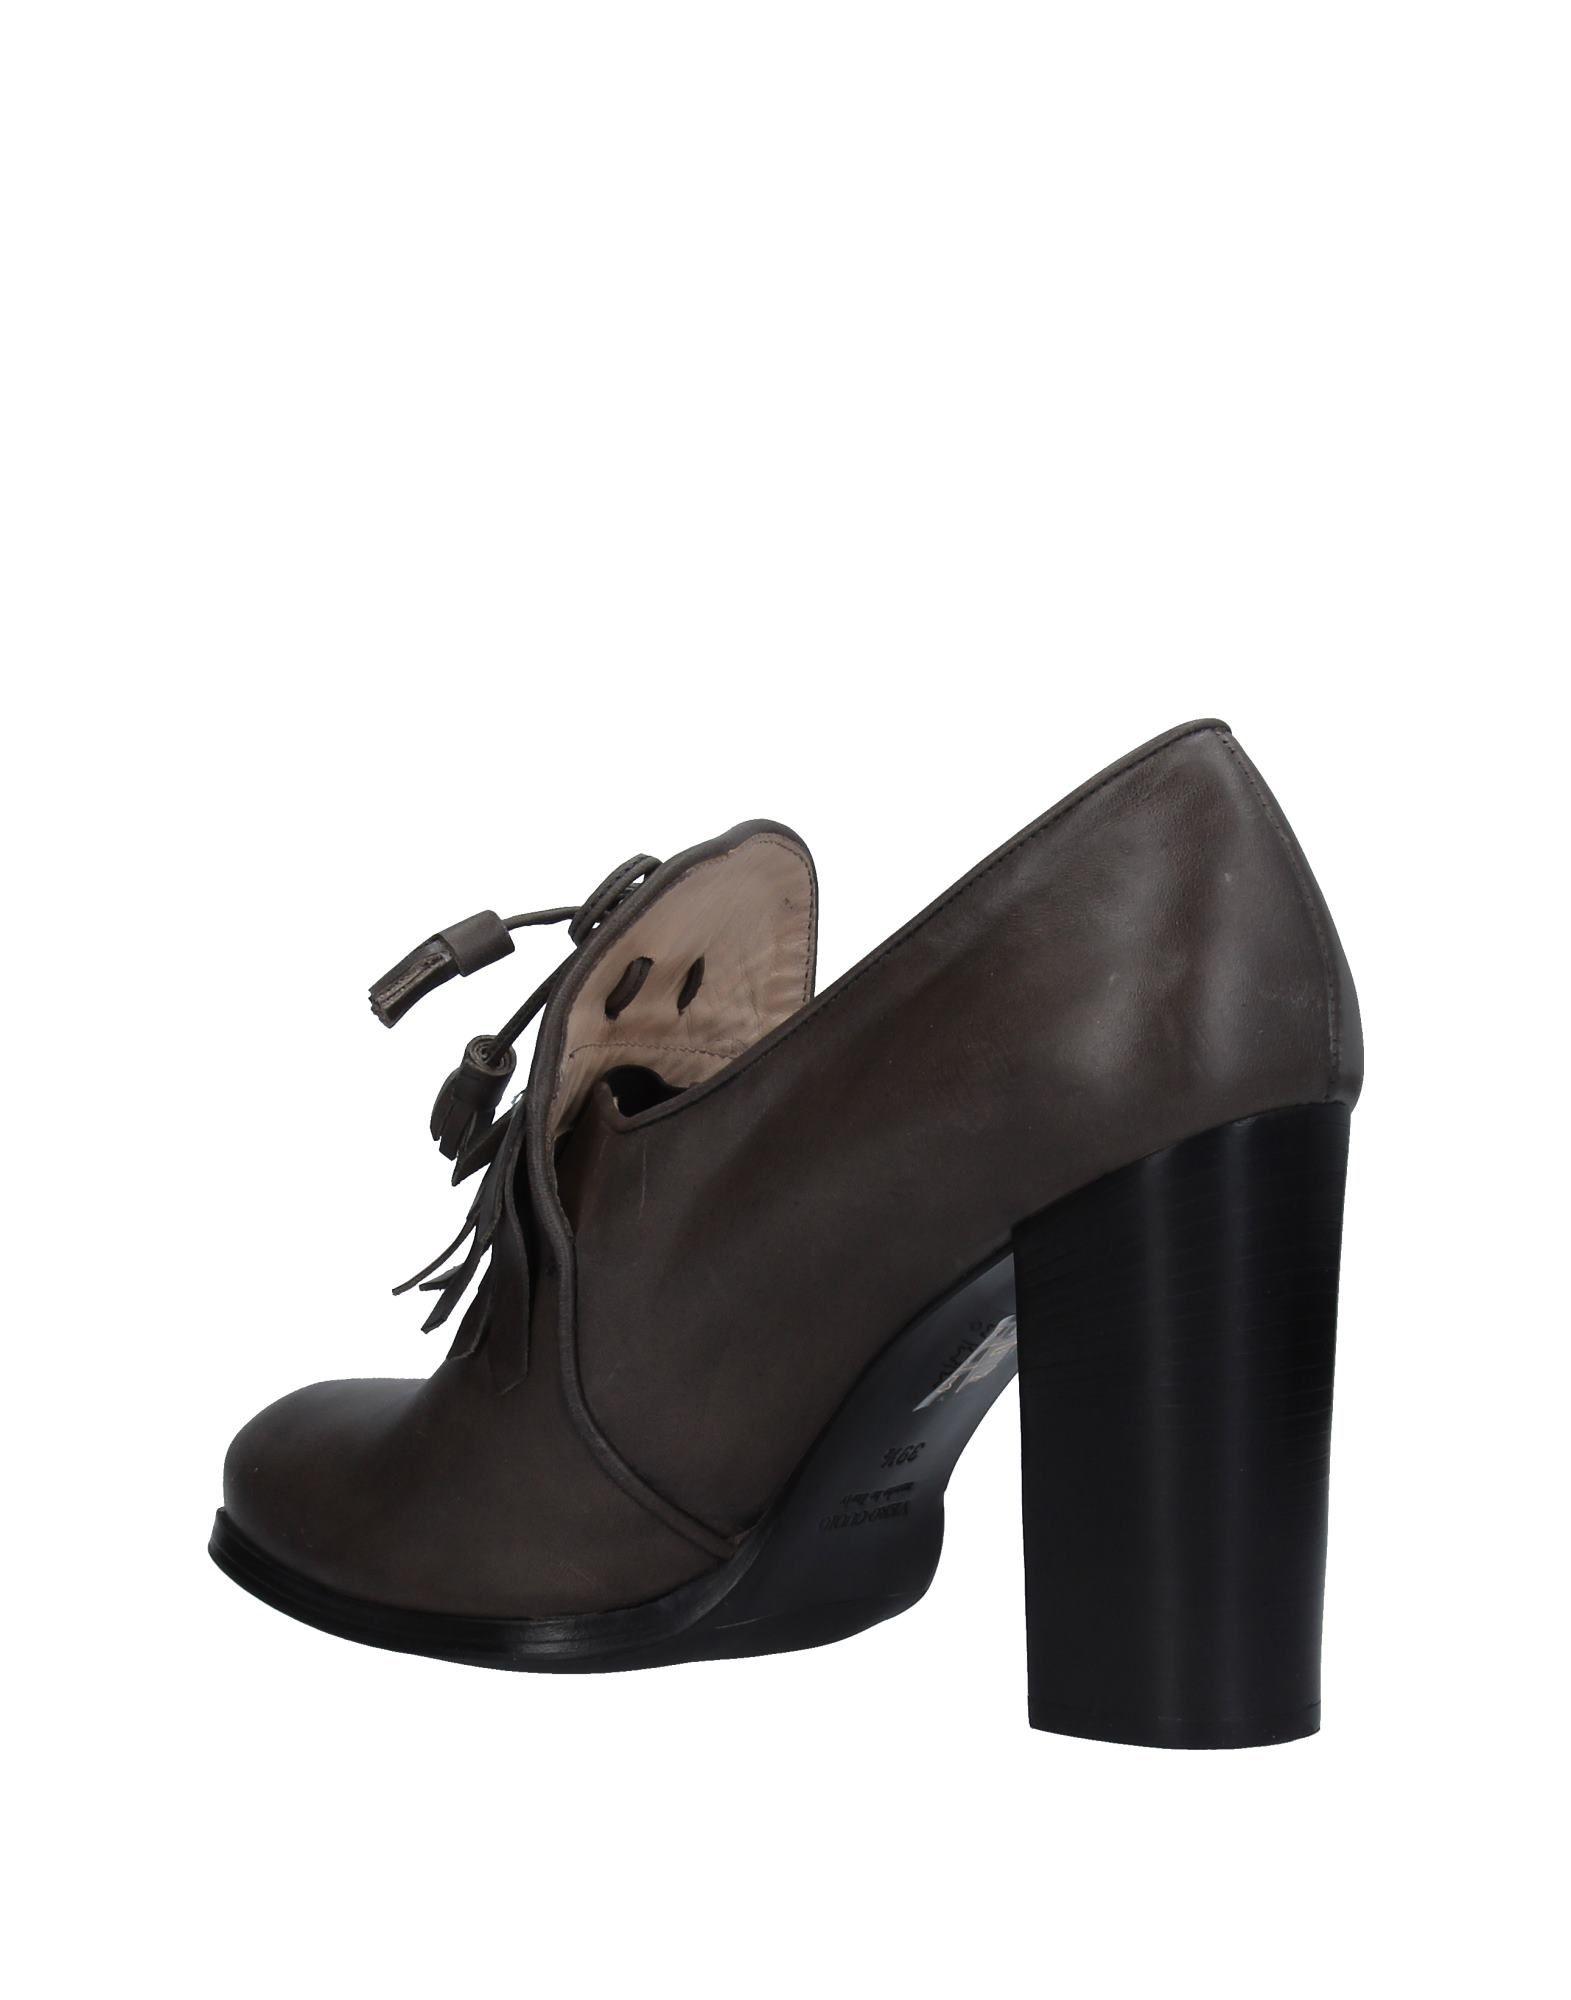 Stilvolle billige Schuhe Damen Yosh Collection Mokassins Damen Schuhe  11274172CN 5eca9d